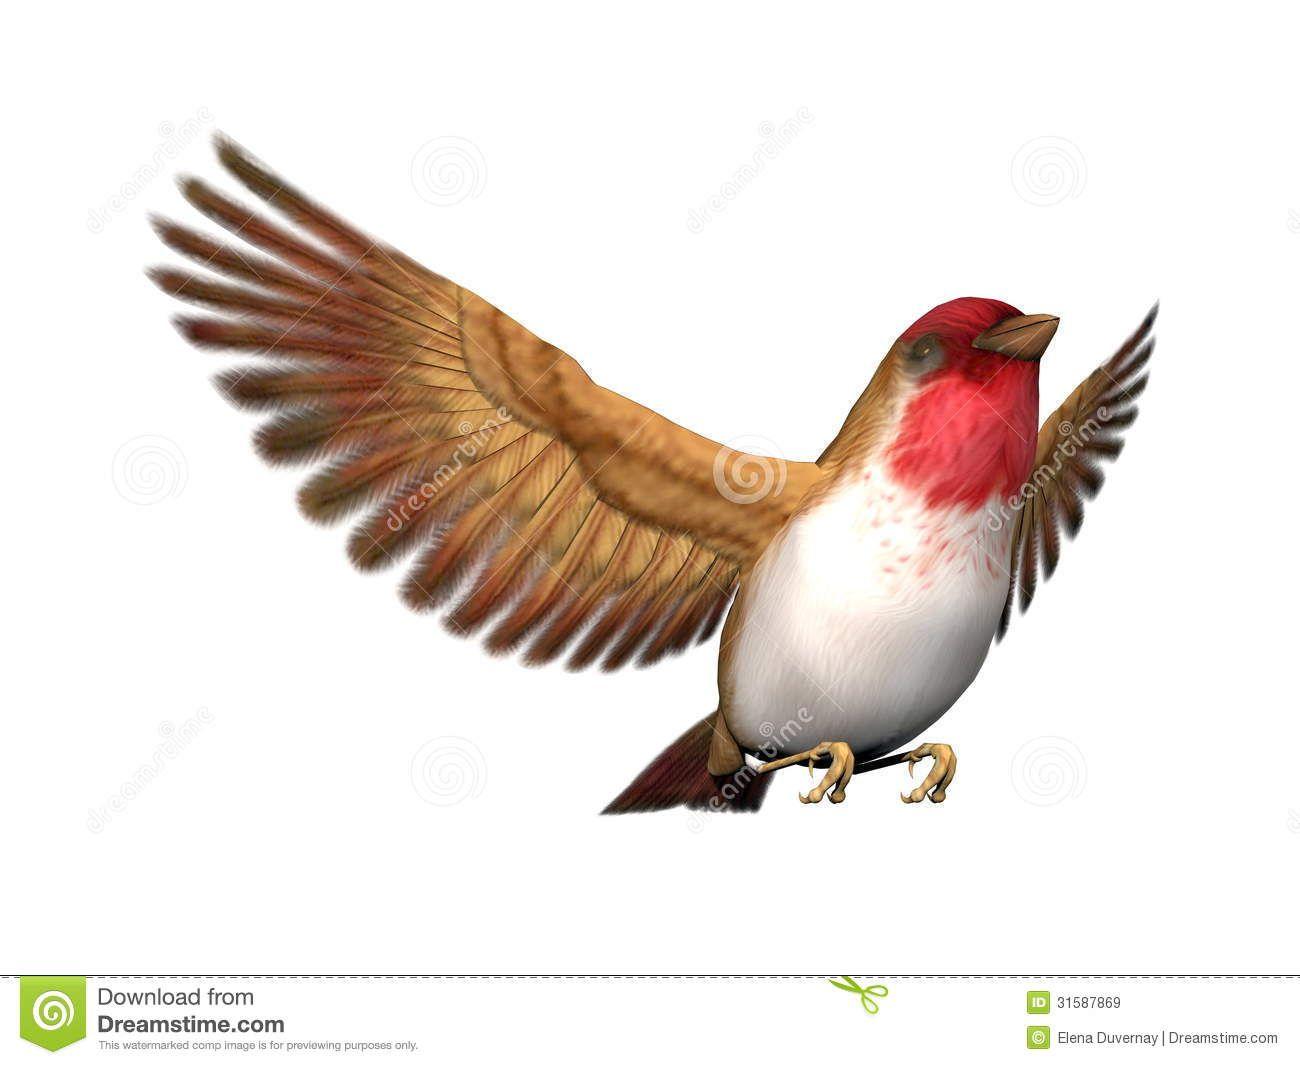 scarlett-finch-bird-d-render-flying-open-wings-white-background-31587869.jpg 1300 × 1065 bildepunkter